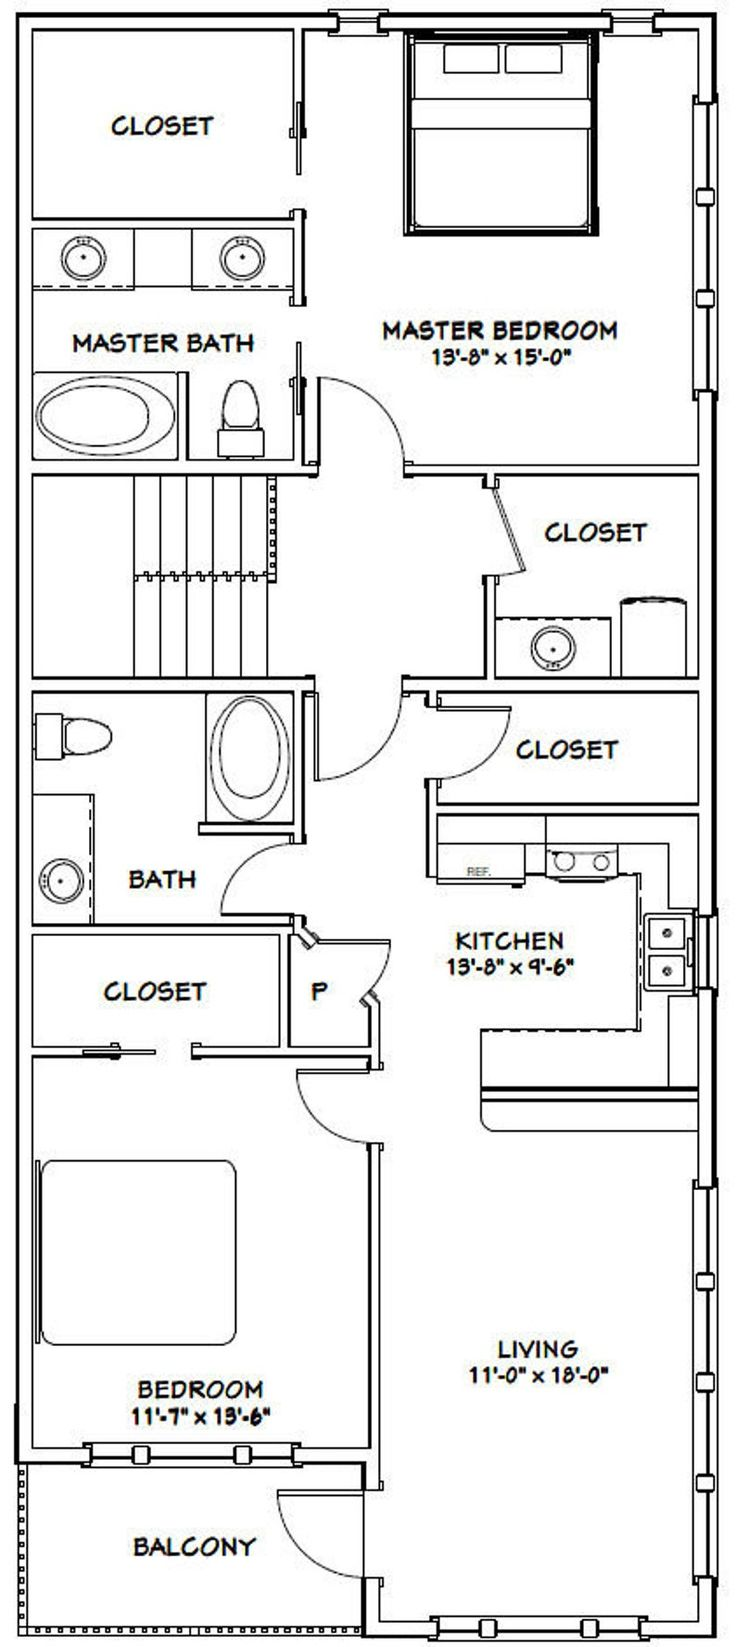 60x50 House 2Bedroom 2.5Bath 1,694 sq ft PDF